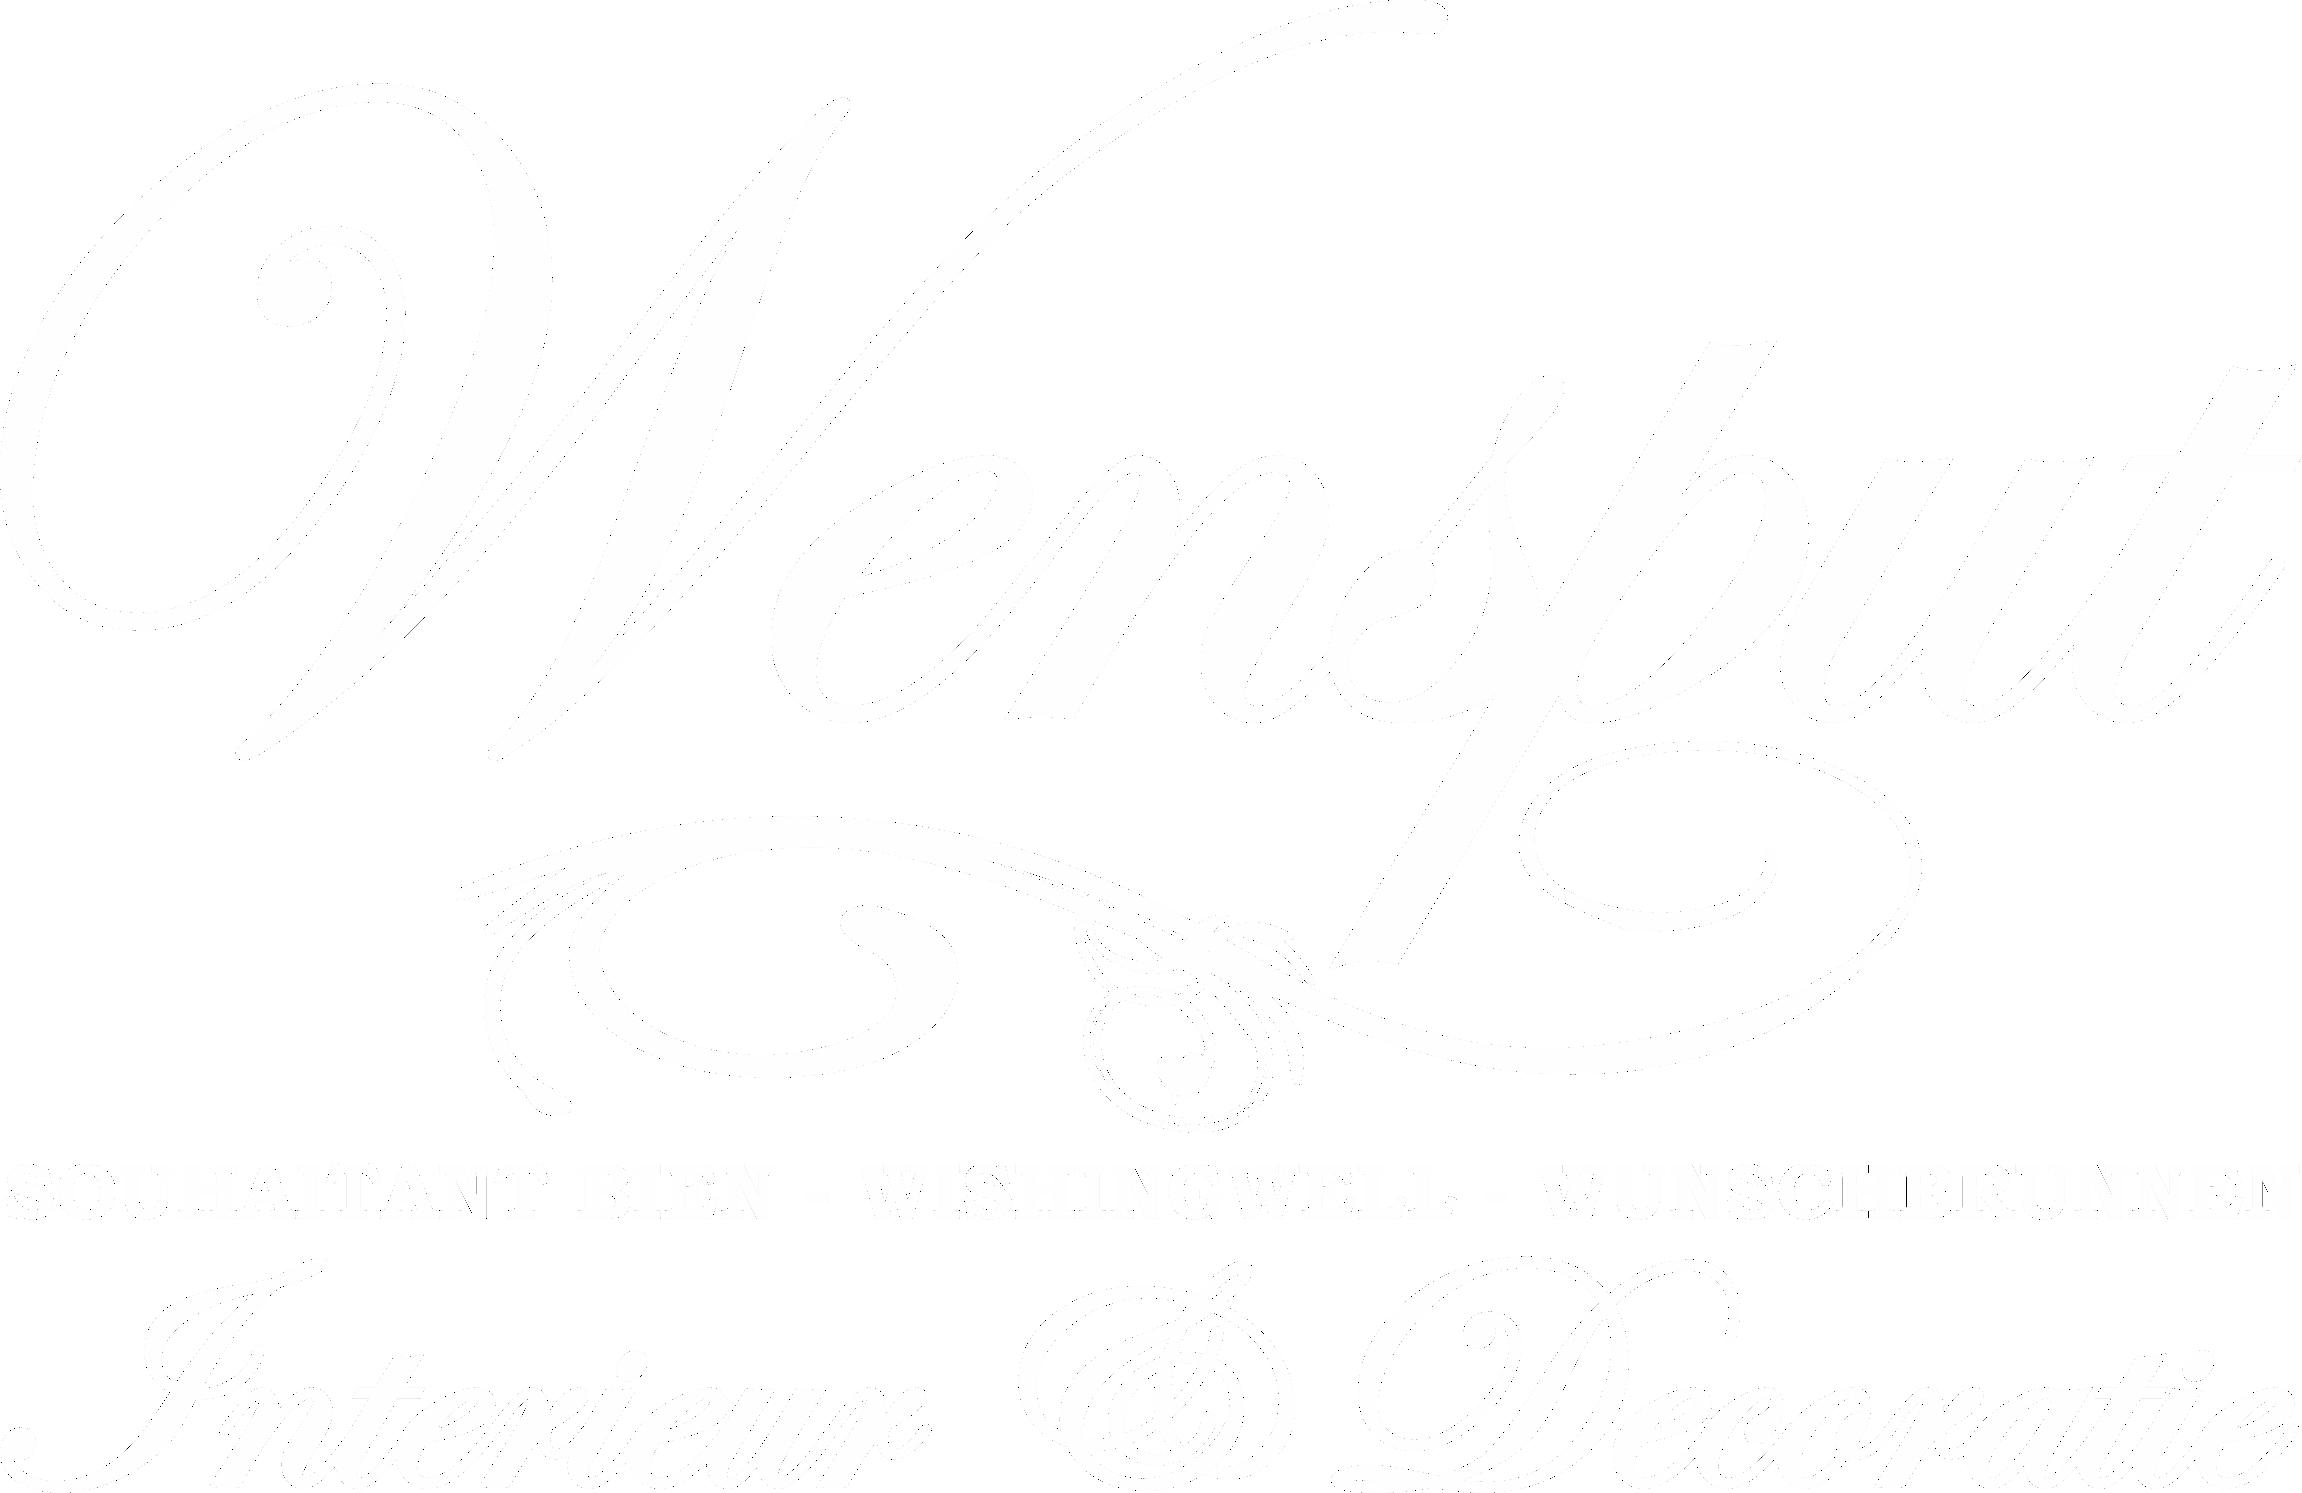 wensput